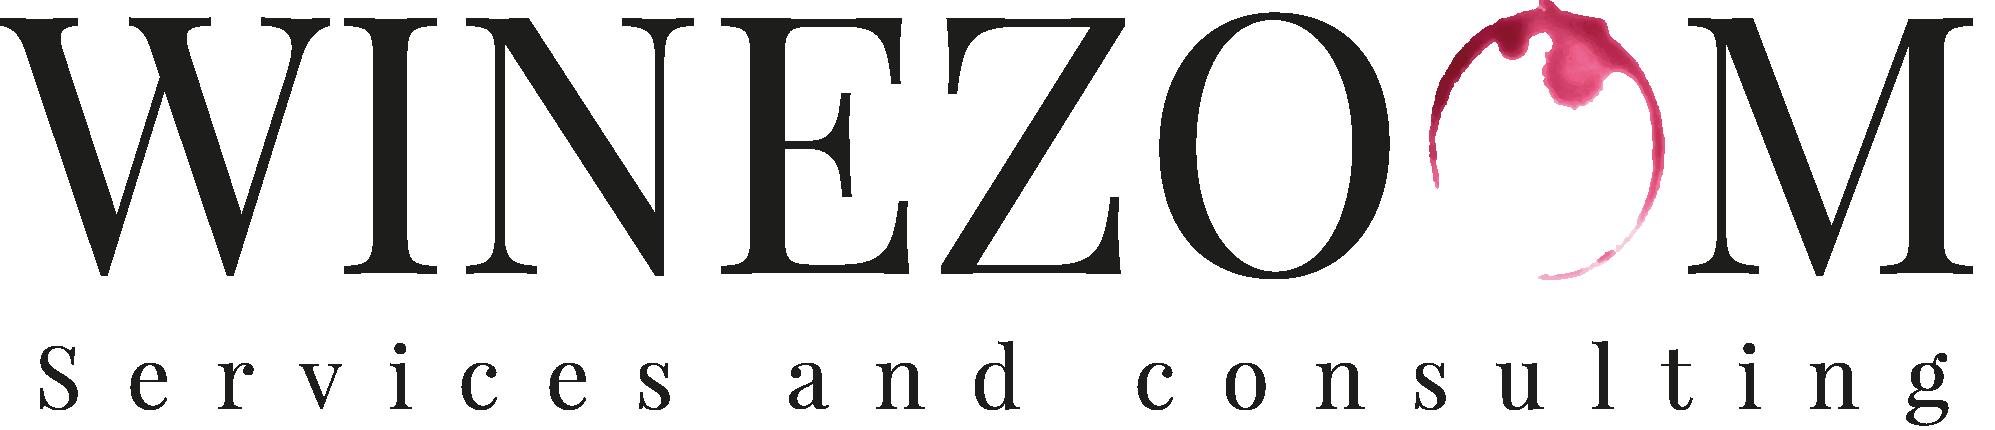 Winezoom logo